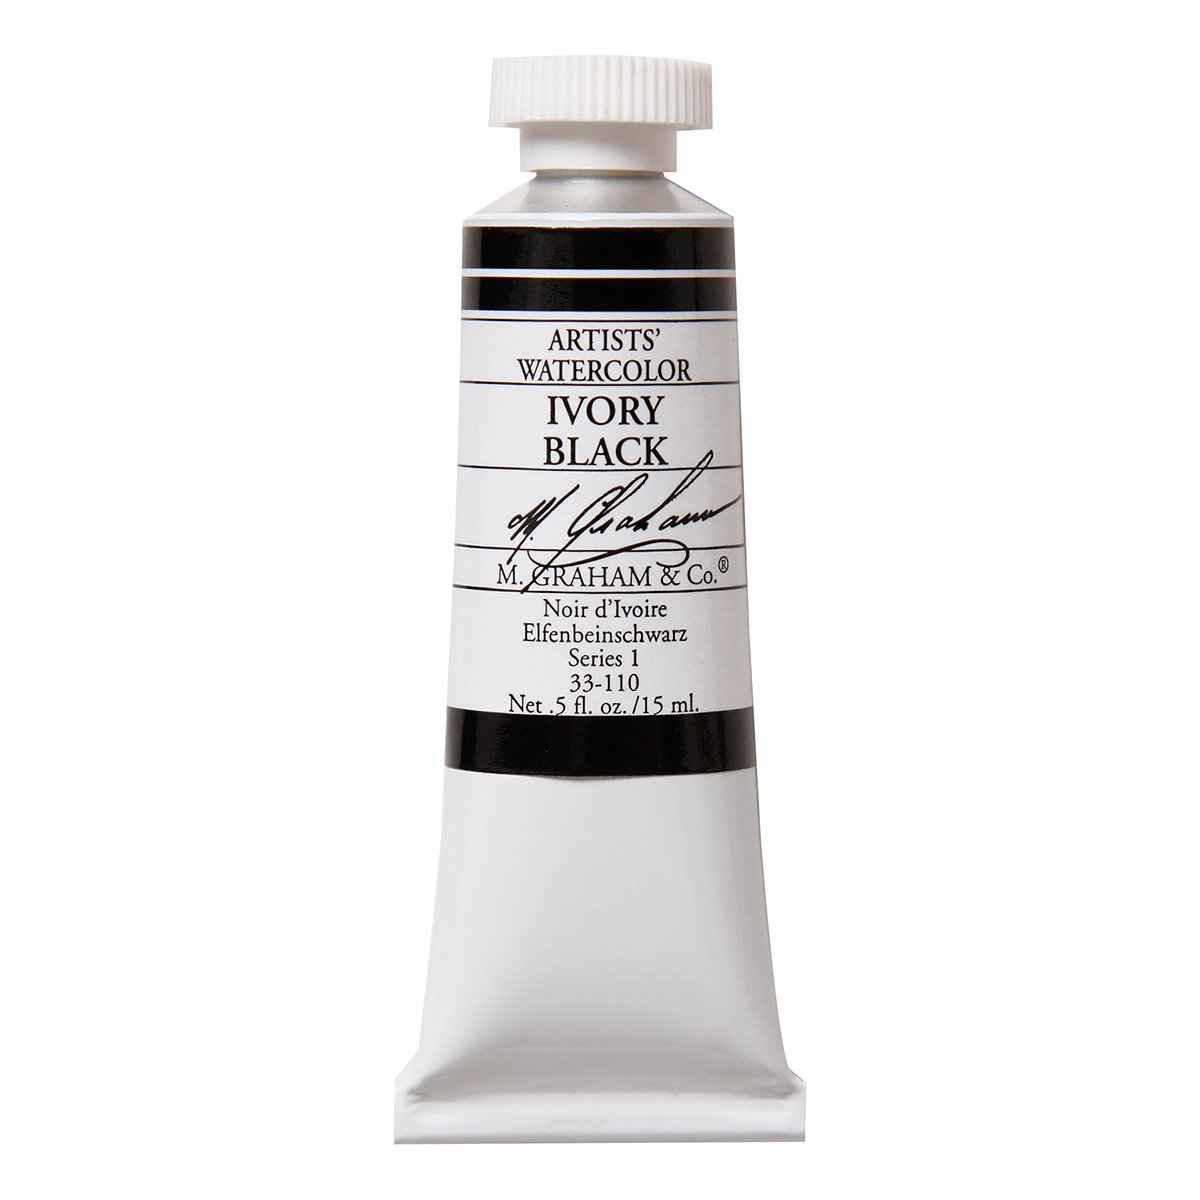 M. Graham 1/2-Ounce Tube Watercolor Paint, Ivory Black